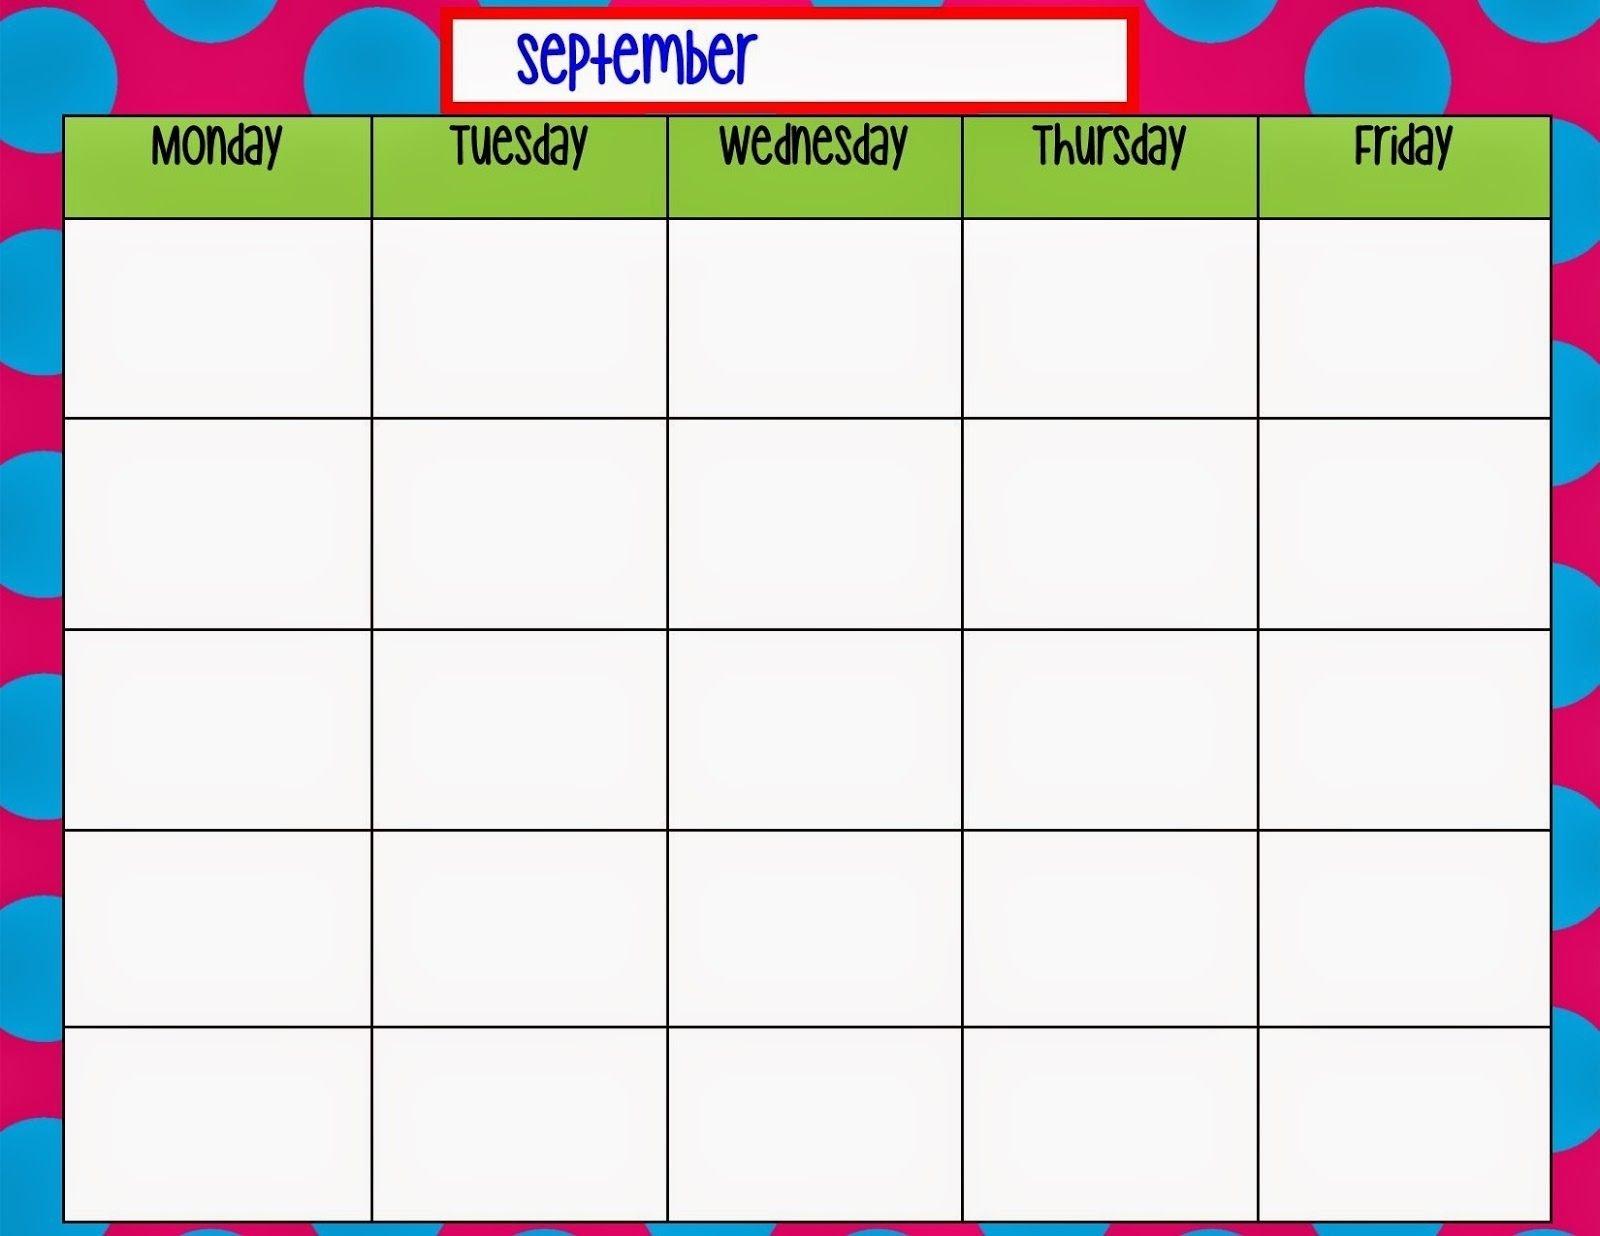 Monday Through Friday Schedule Printable - Calendar Monday Through Friday Calendar Printable